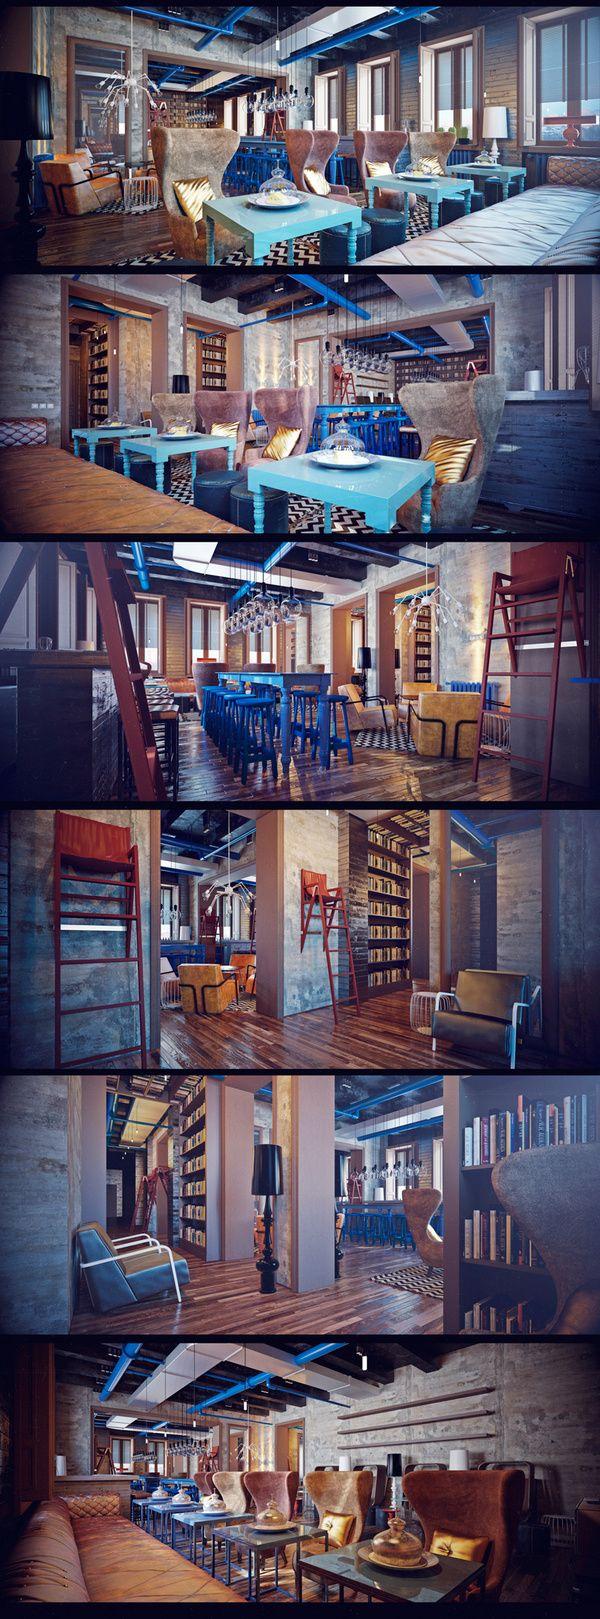 159 best art bar images on pinterest | cafes, restaurant interiors